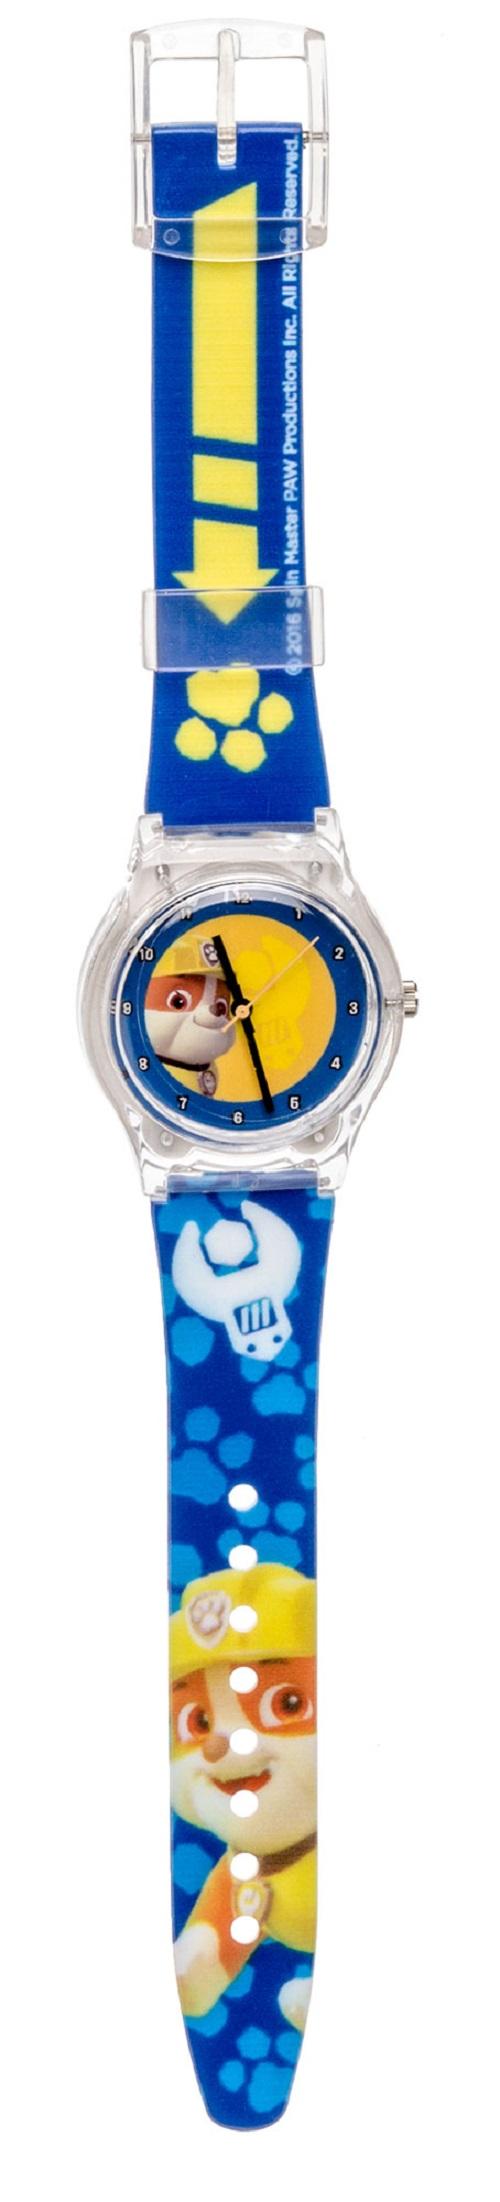 Paw Patrol Kinder-Armbanduhr Variante 2